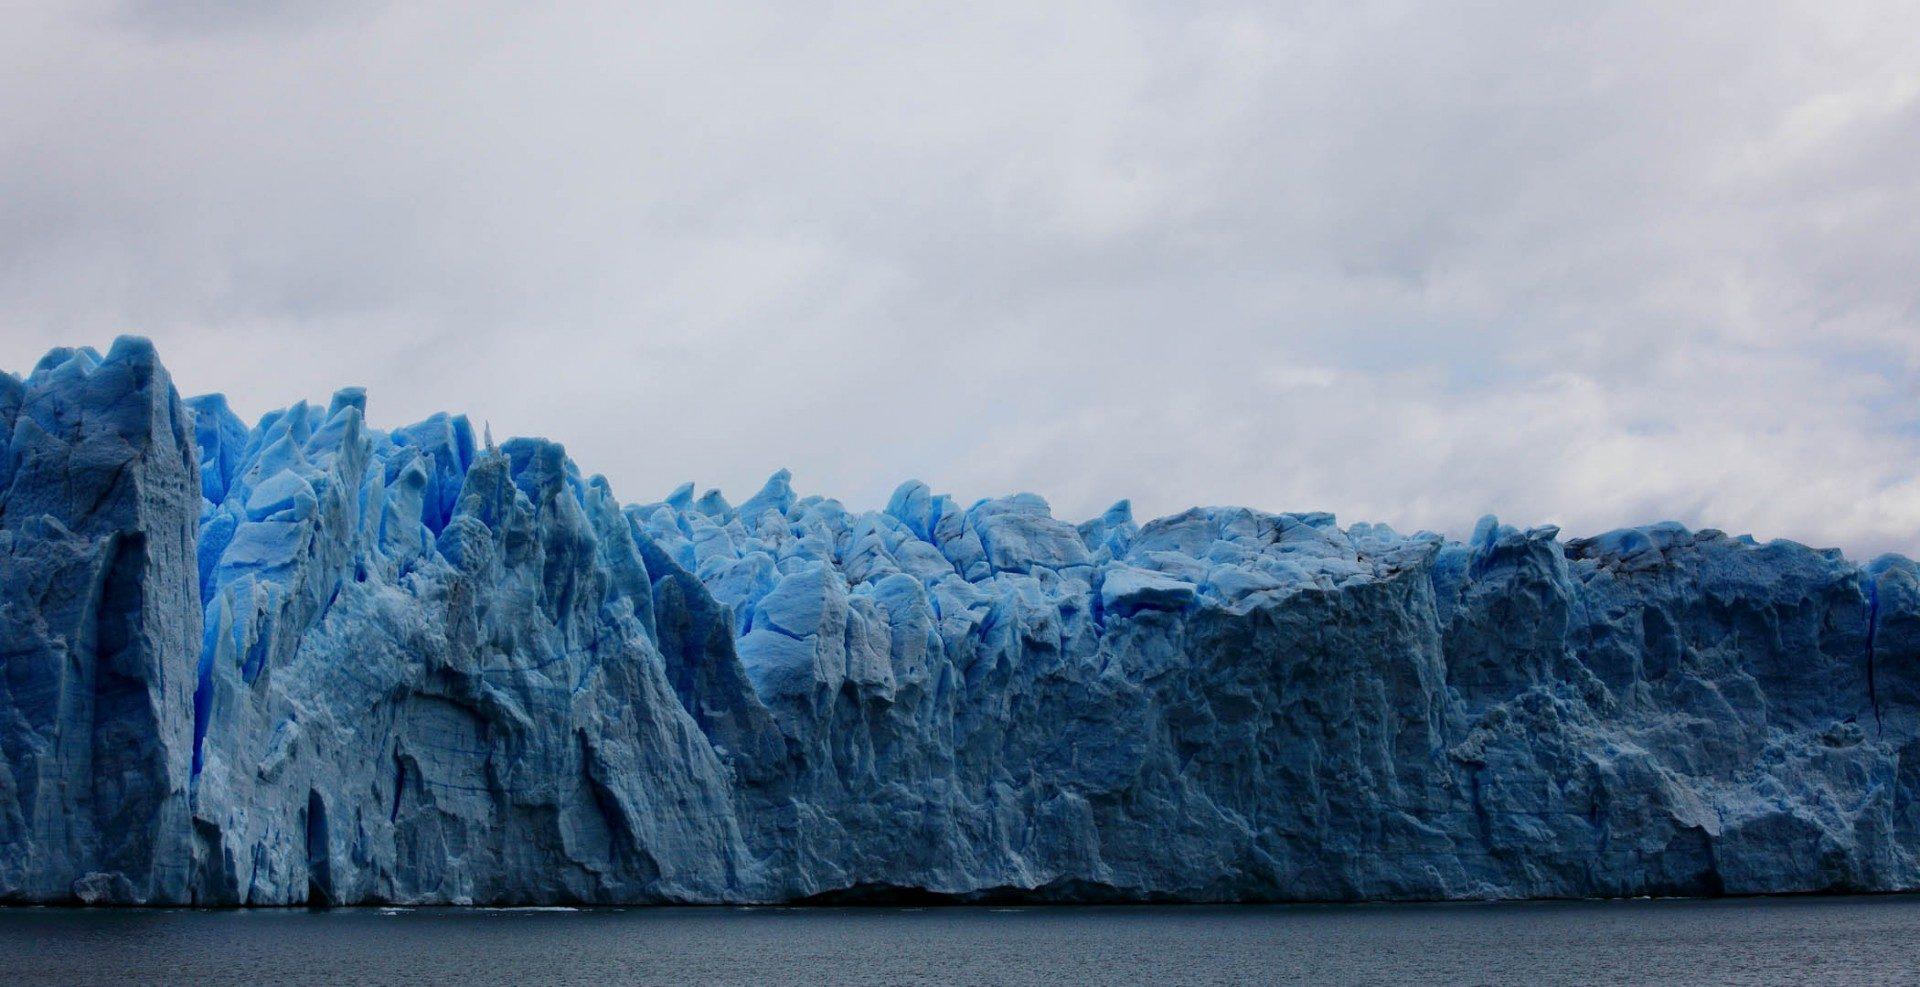 patagonia perito moreno photography